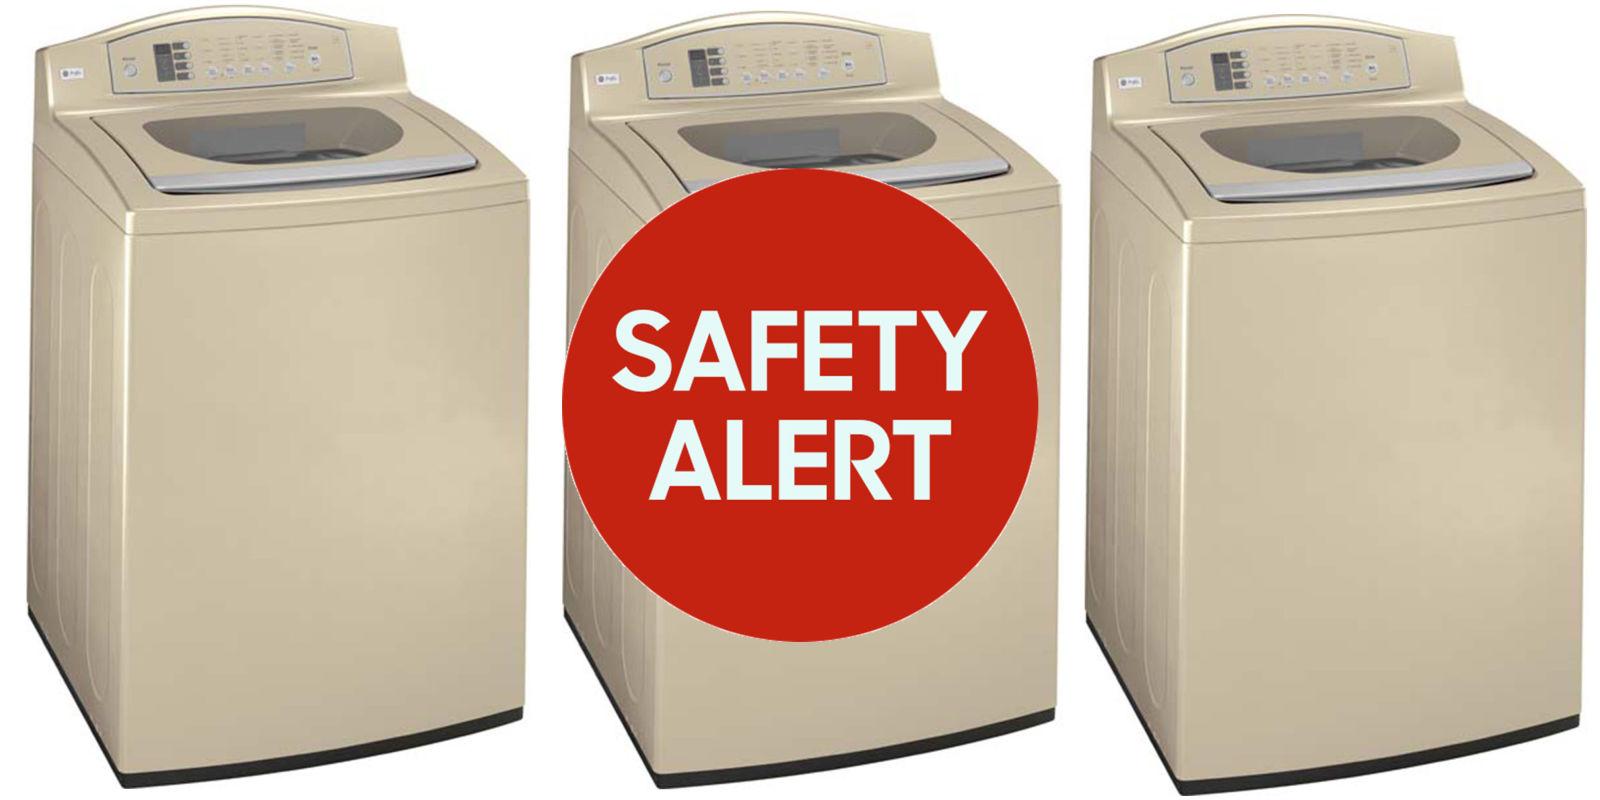 GE Recalls Clothes Washers Due To Fire Hazard Washing